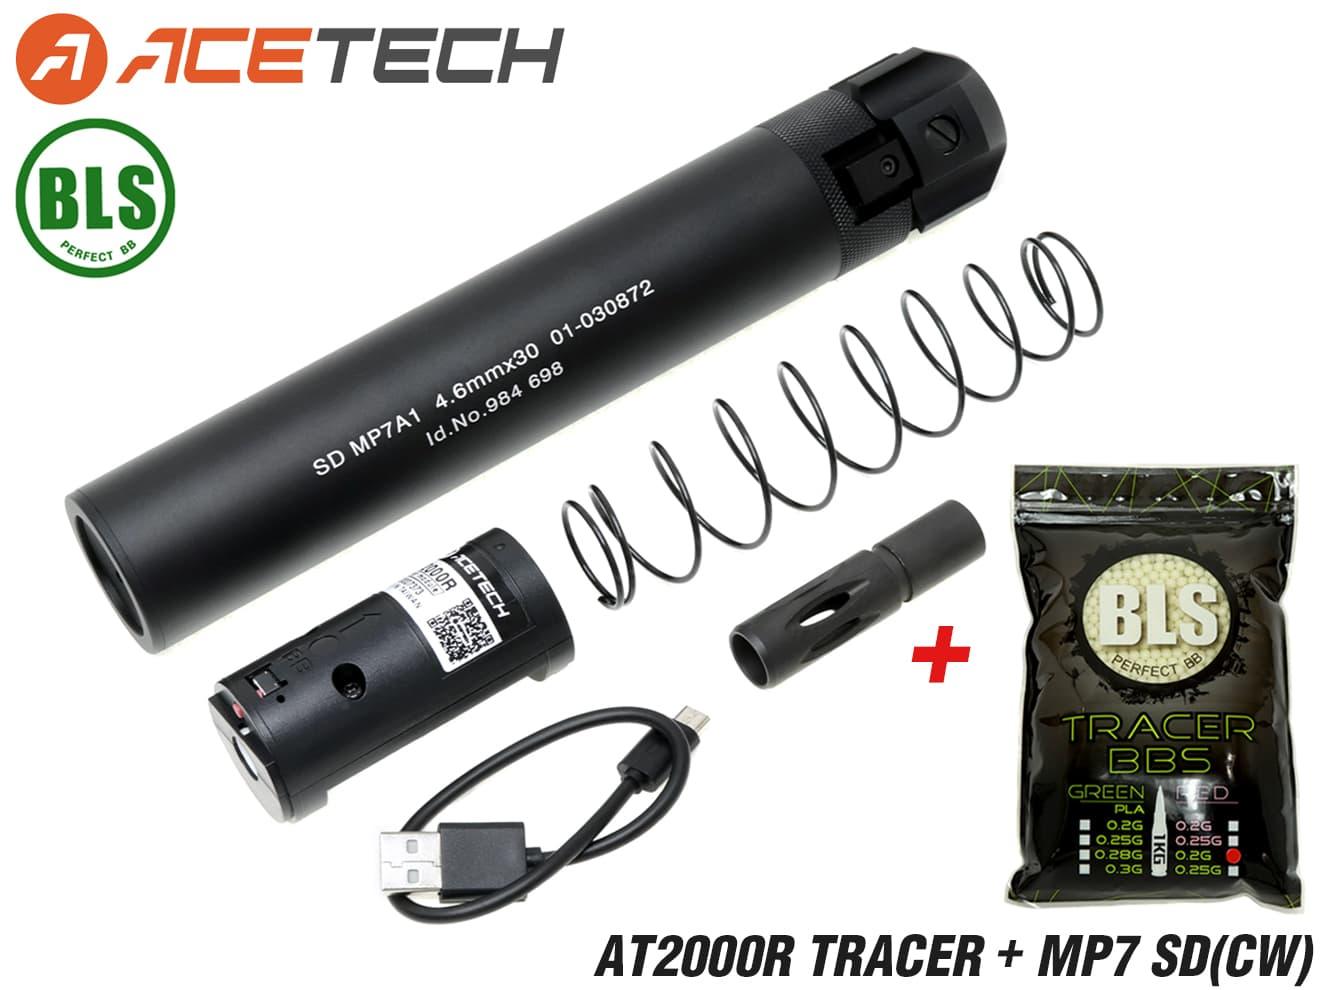 0.2g トレーサーBB弾 フルオートトレーサー AT2000 ACETECH 90日保証&日本語取説付 セット w/ MP7タイプ BLS + サイレンサー(VFC)